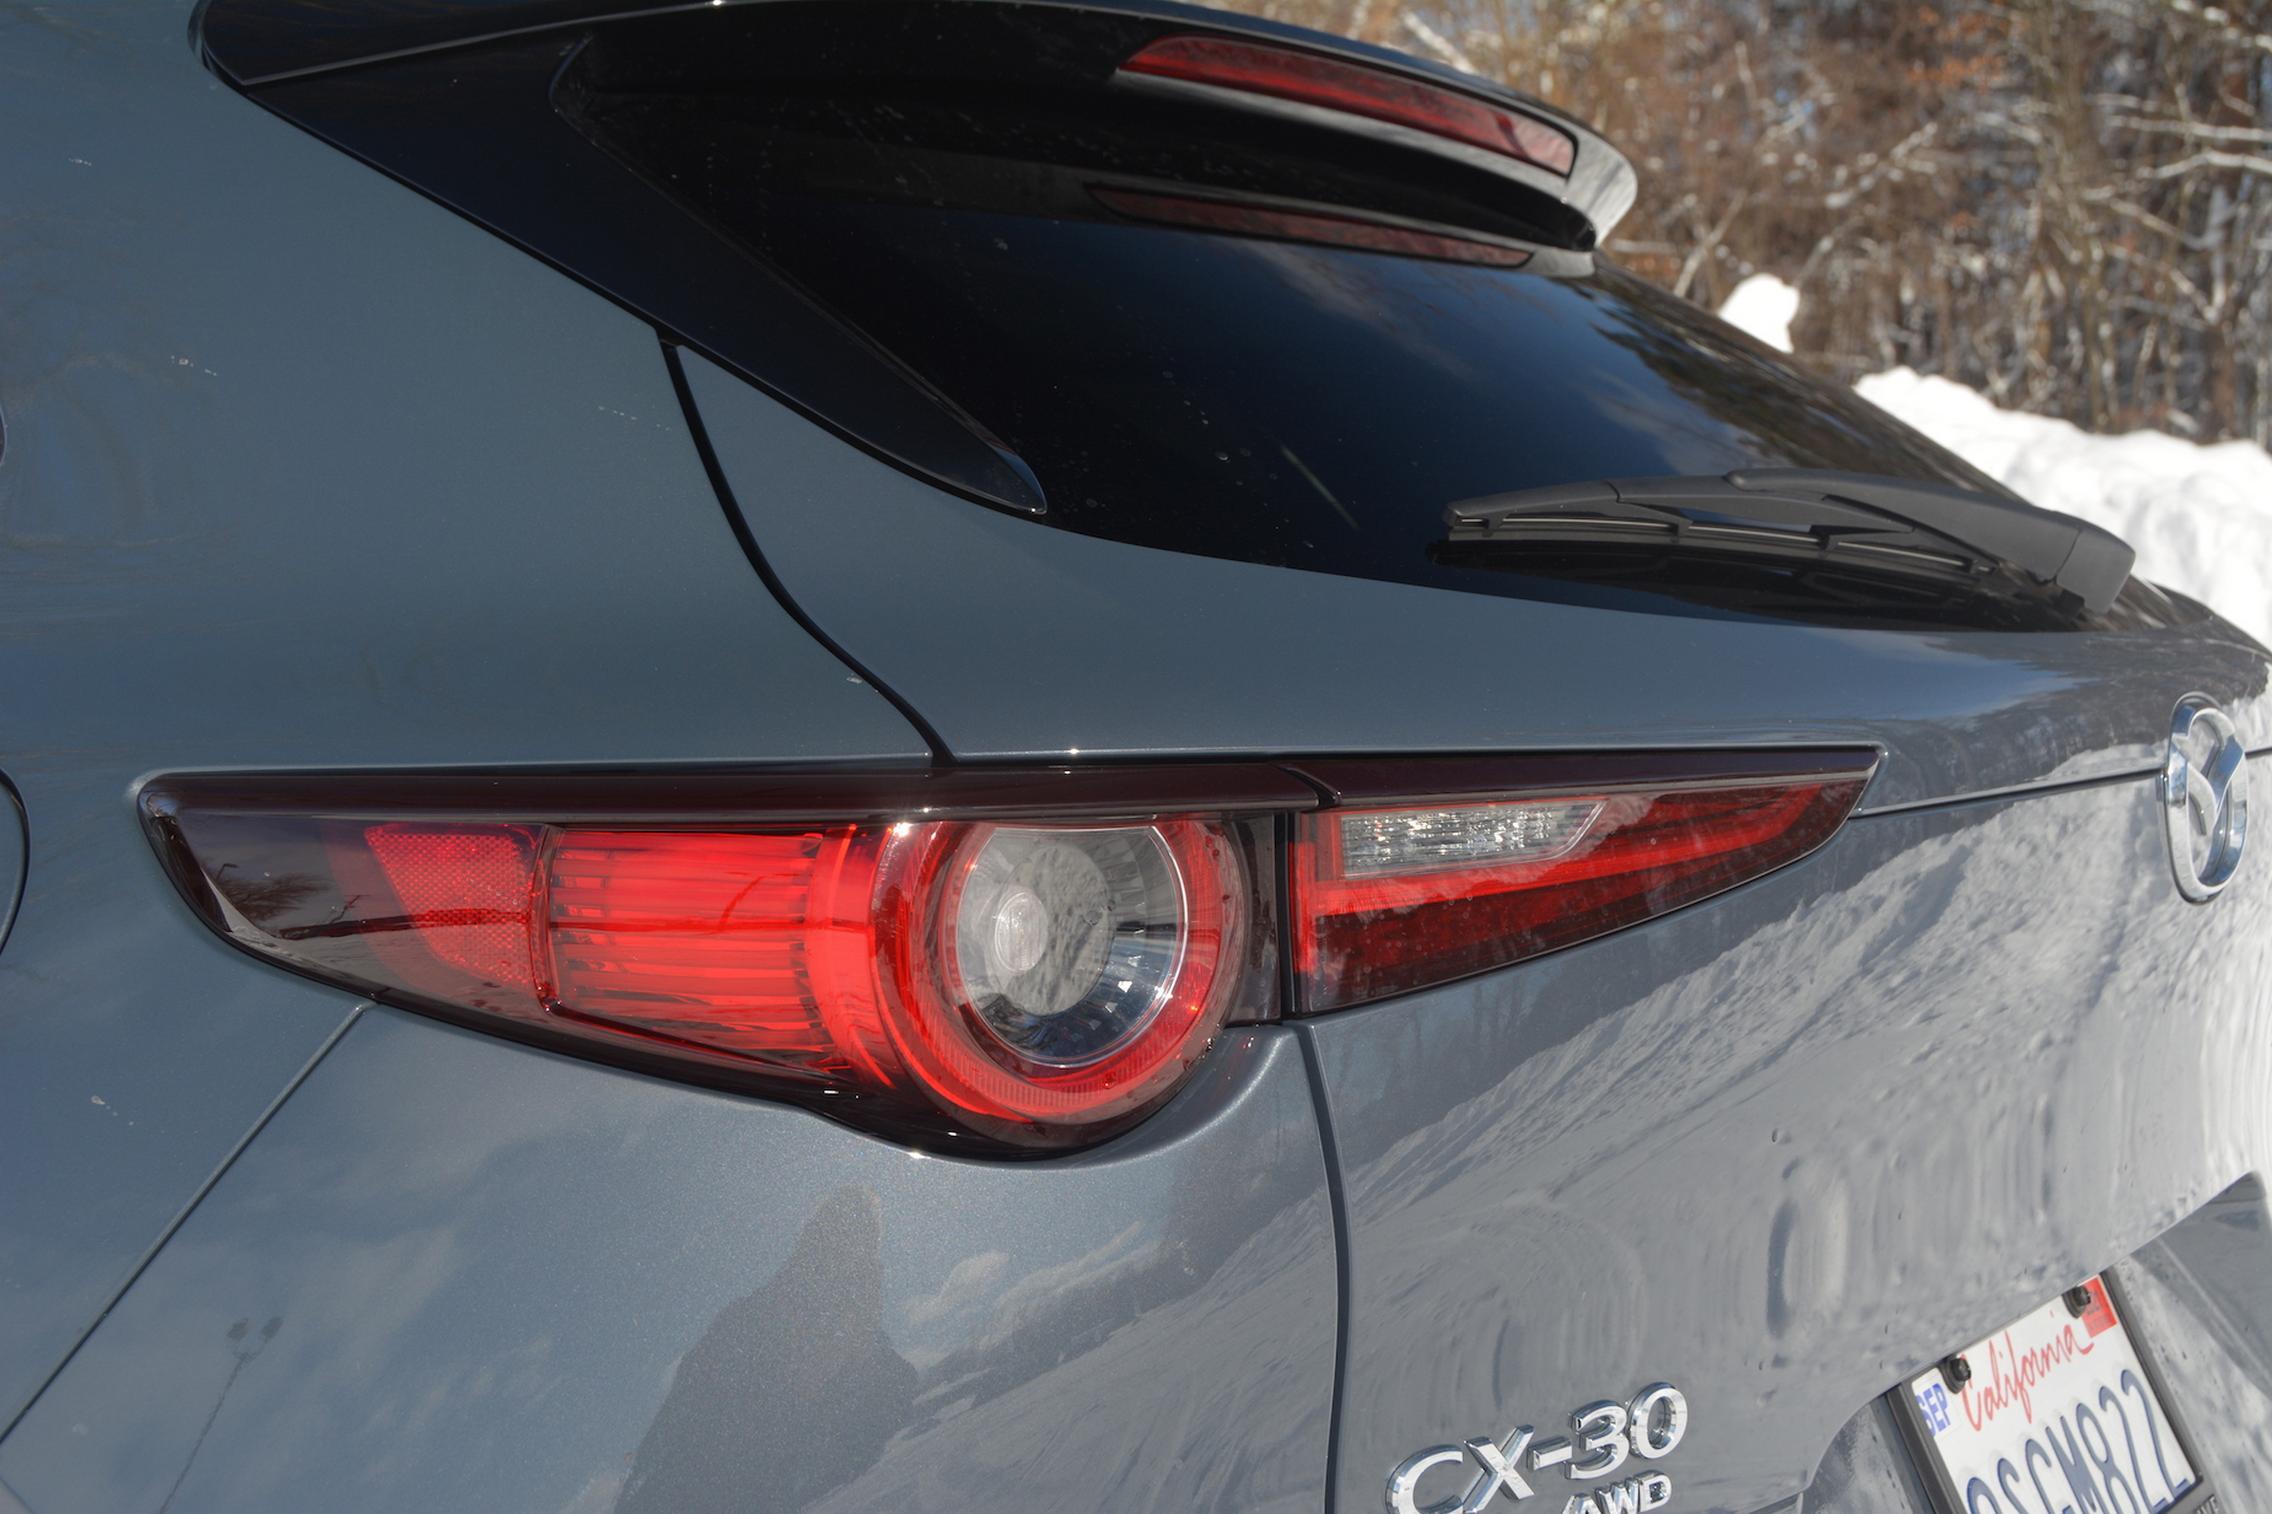 Mazda CX-30 AWD taillight